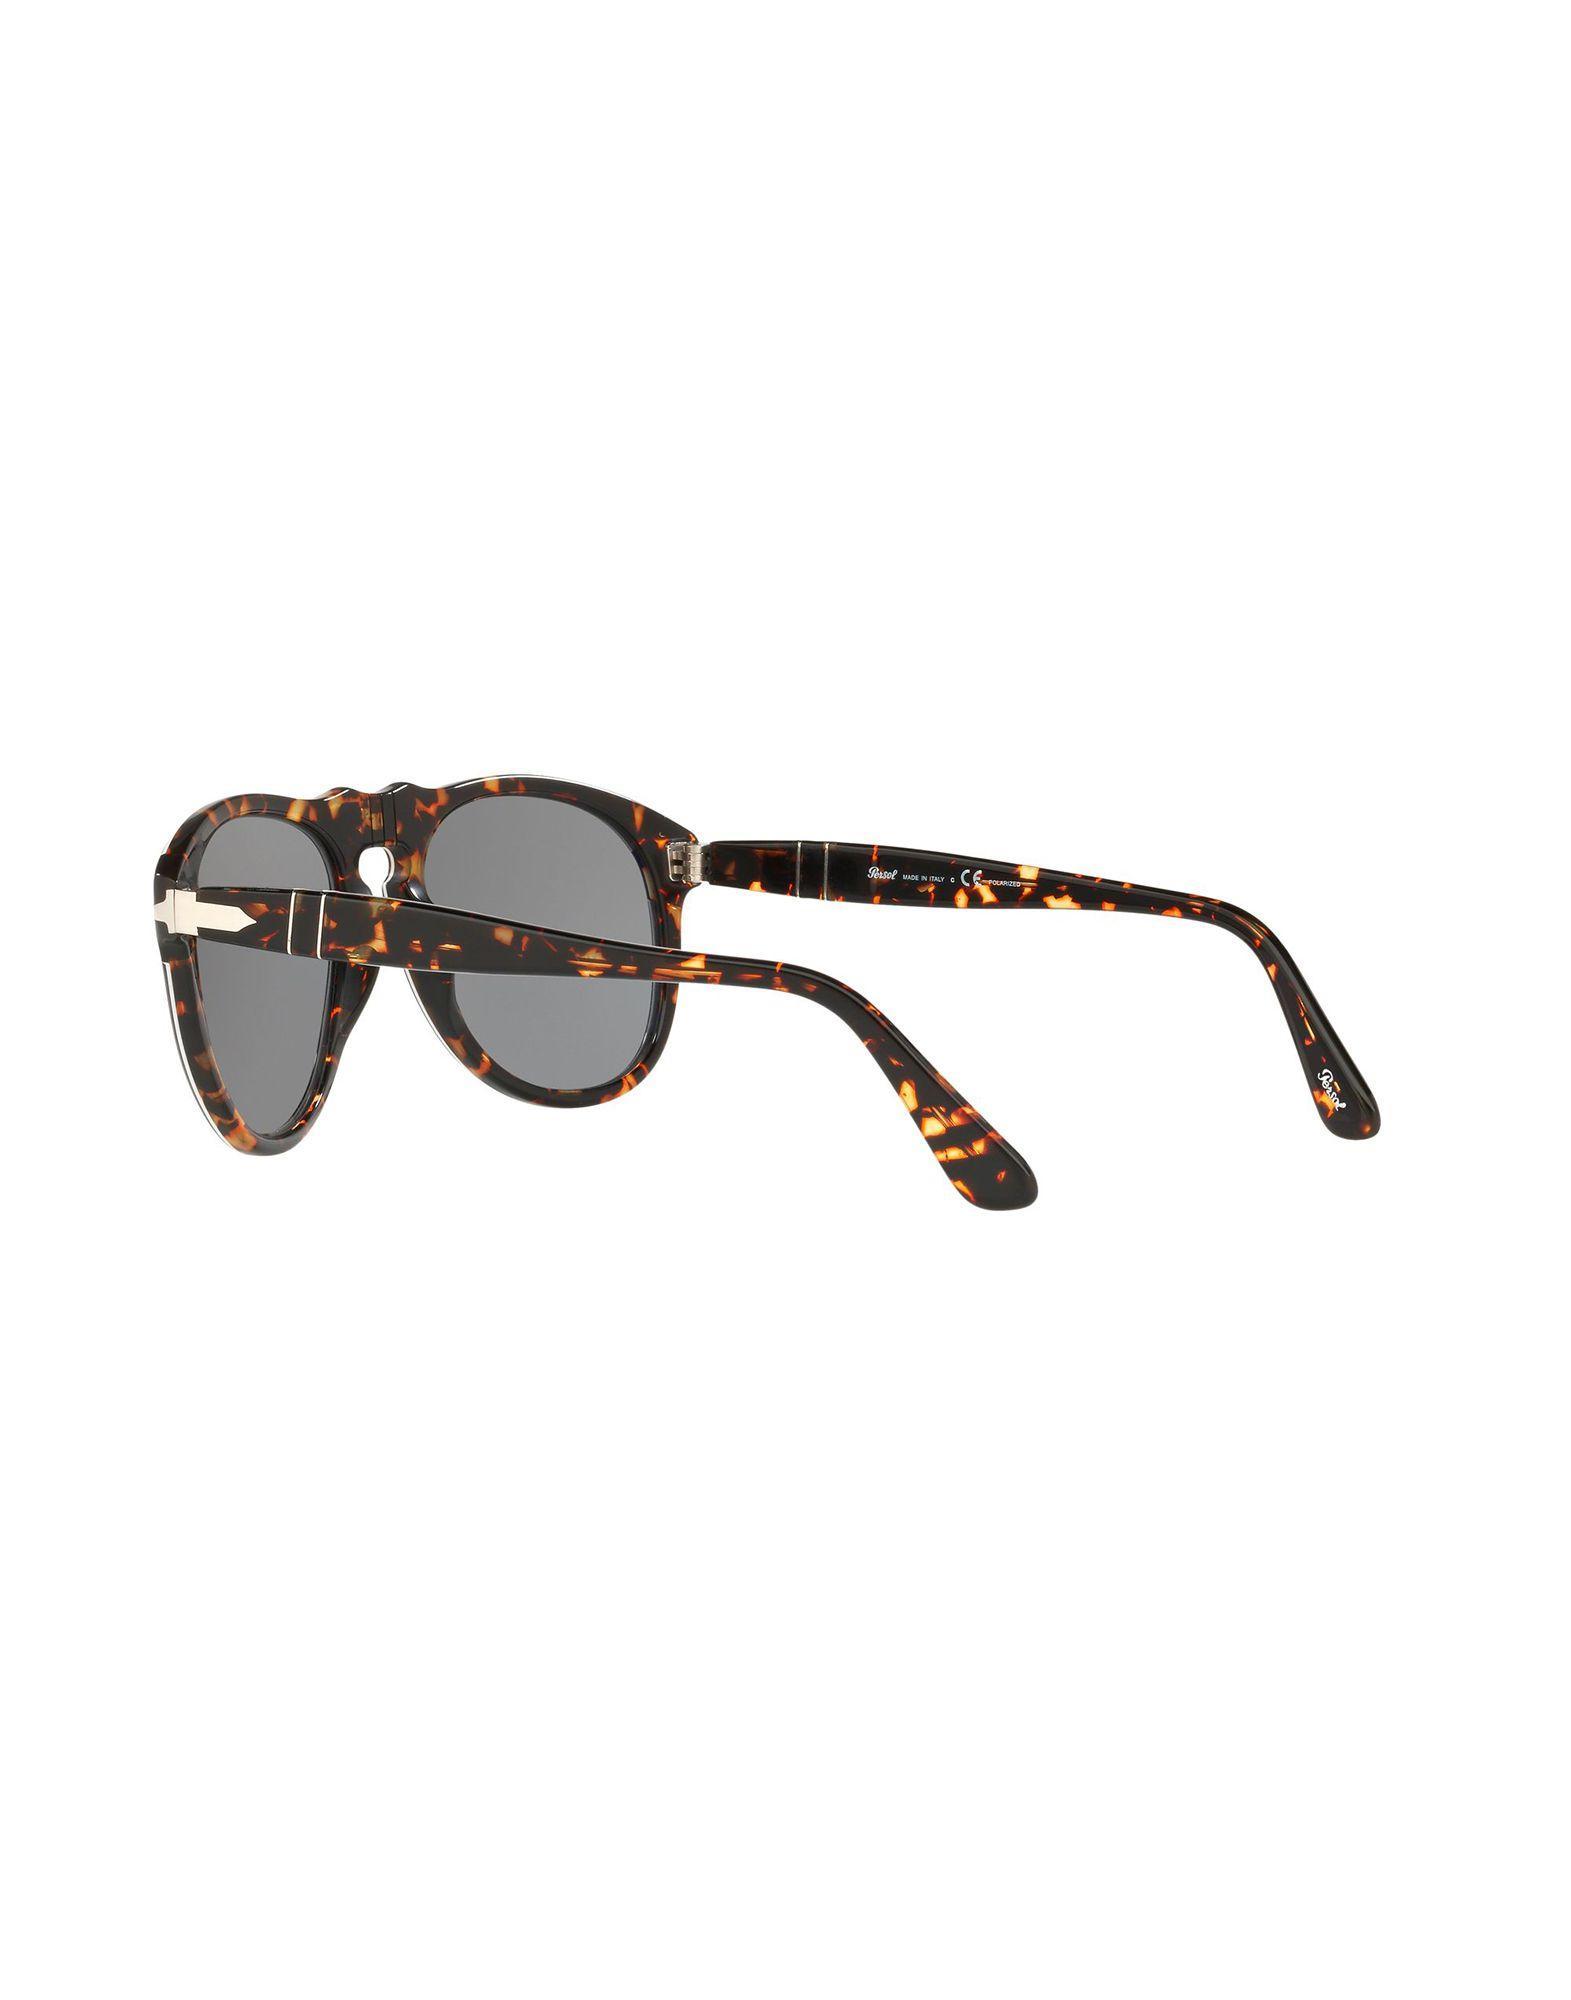 136eeb7776f6f Persol Sunglasses in Black for Men - Lyst